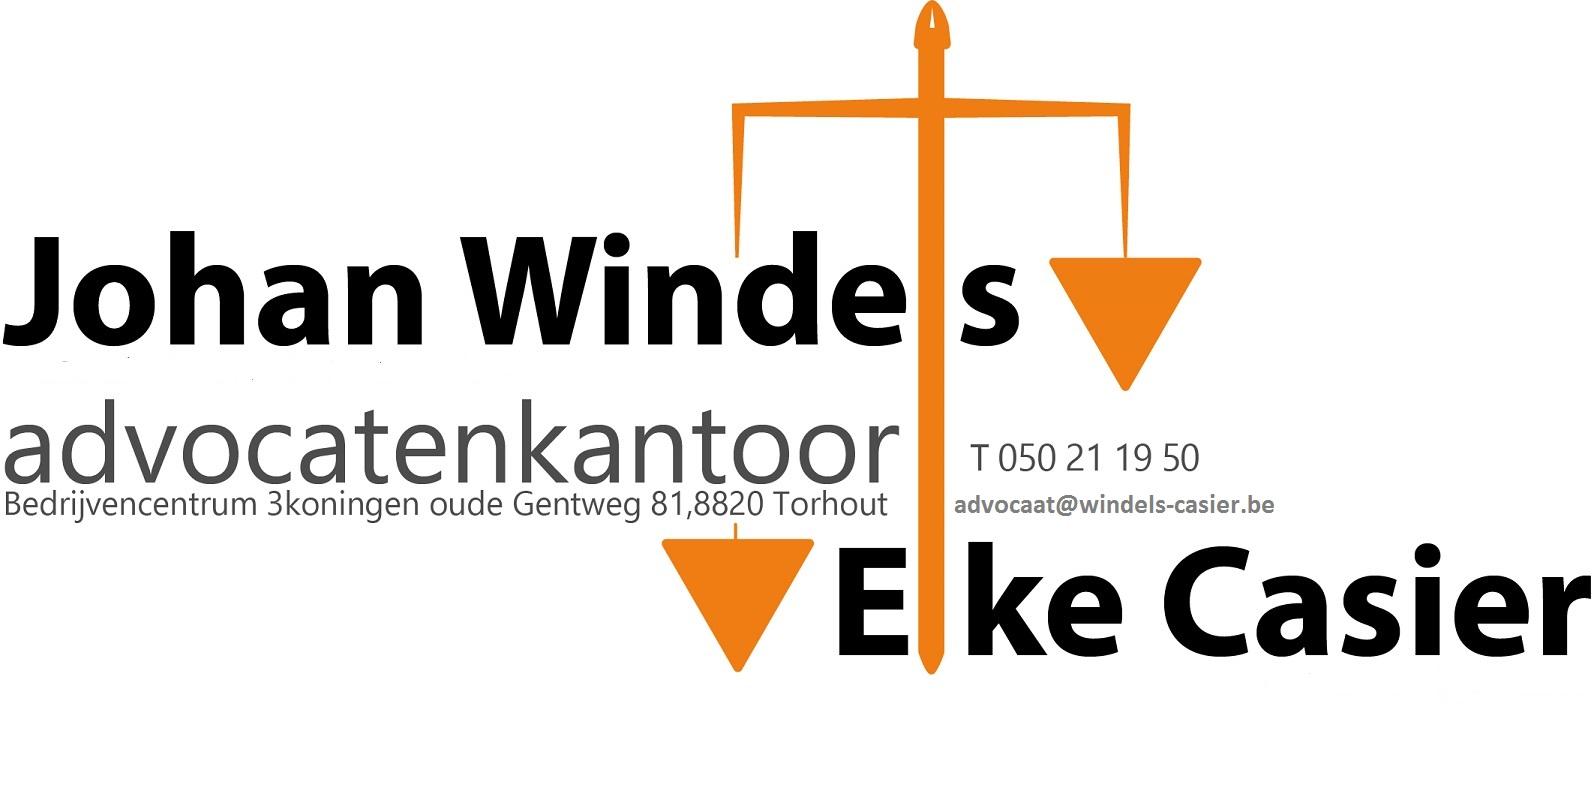 sponsor-logo-advocatenkantooradres-klein